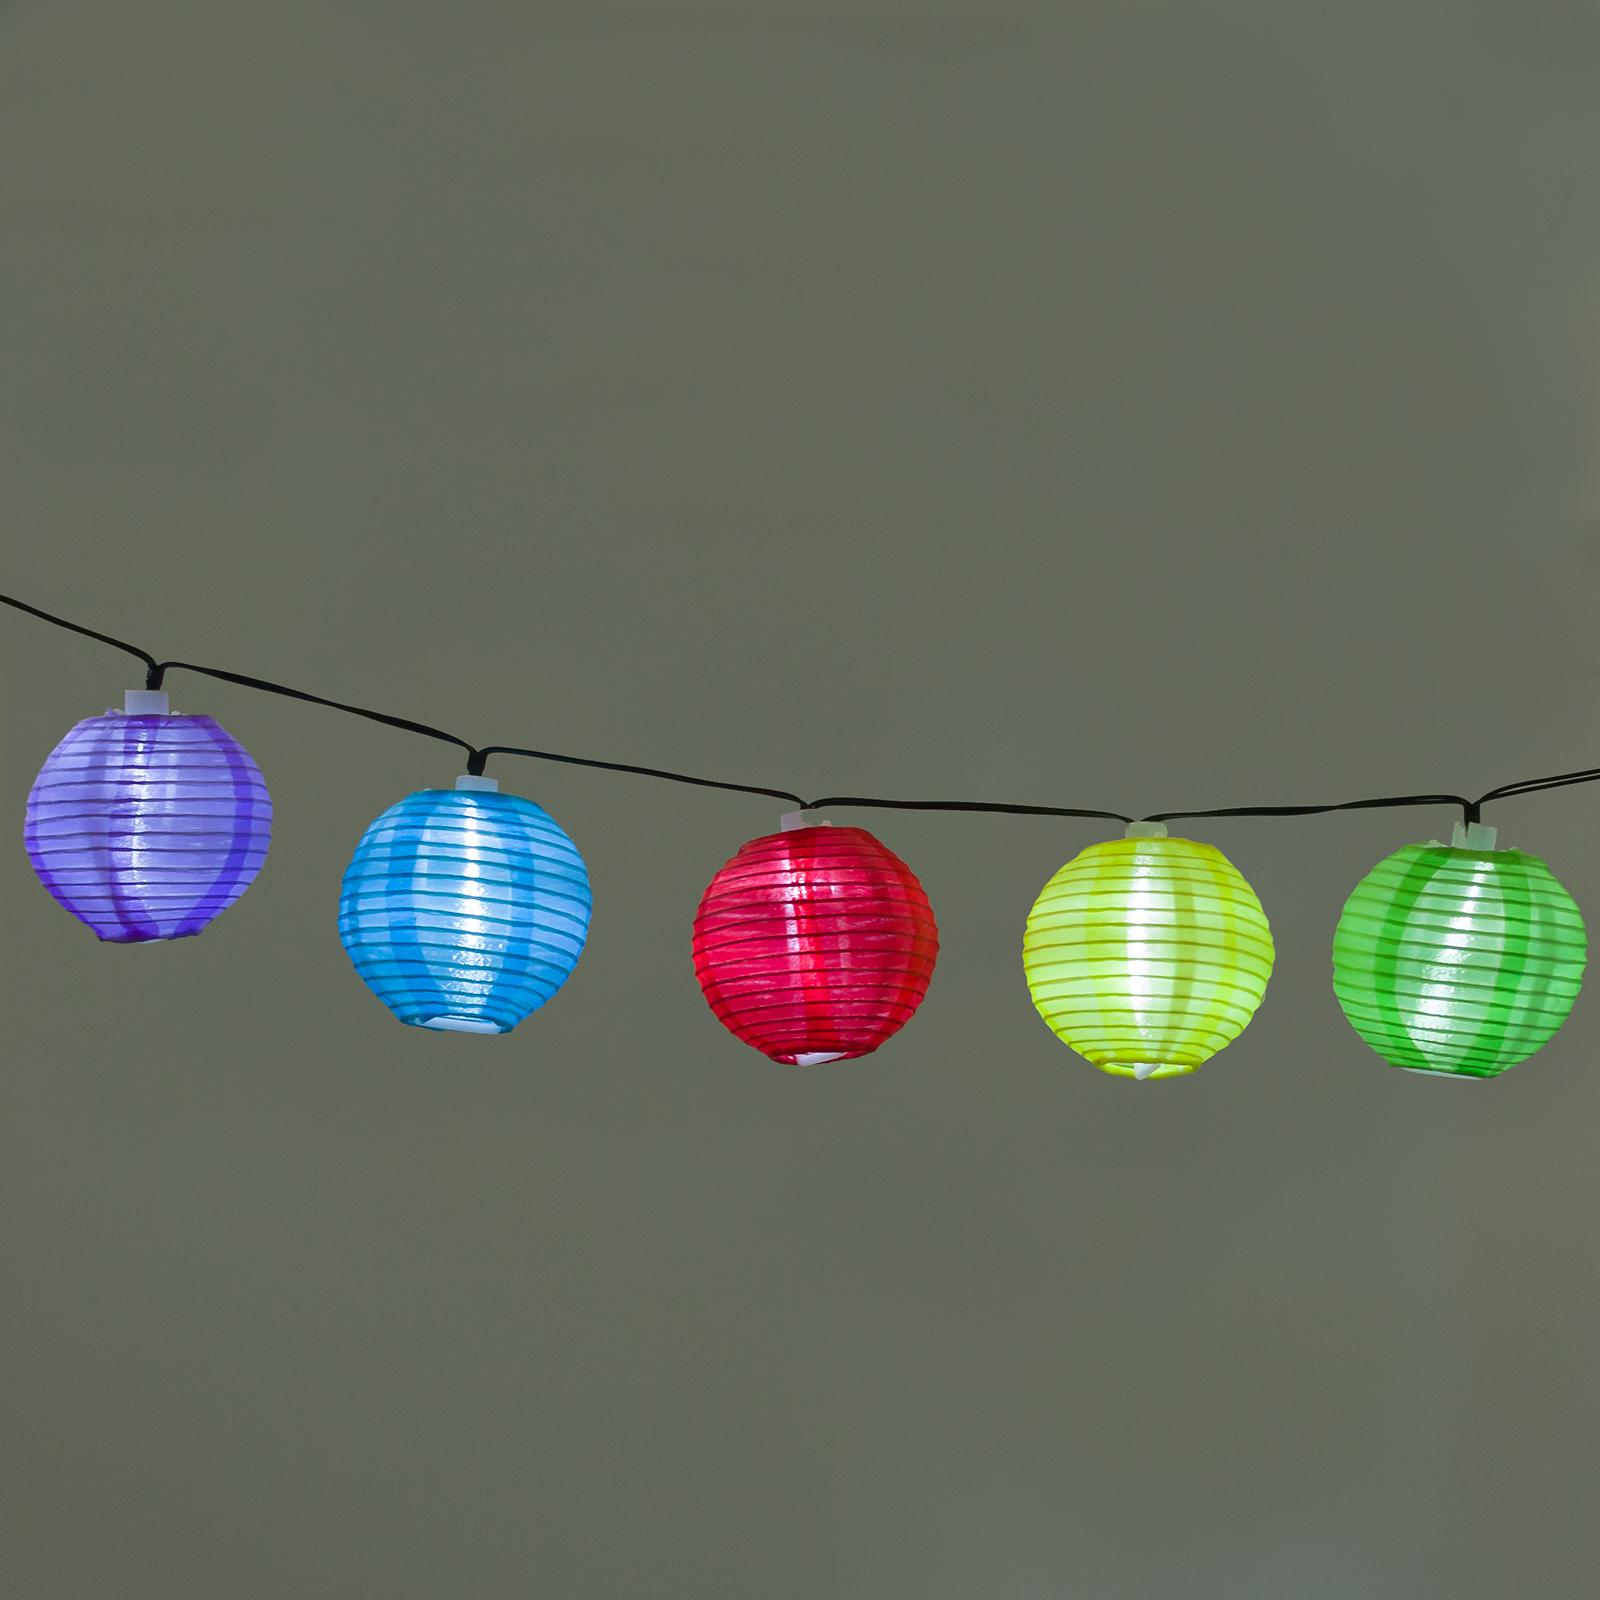 GREENLIGHTING NEW Solar Powered Lantern 20 LED Hanging Decor String Light